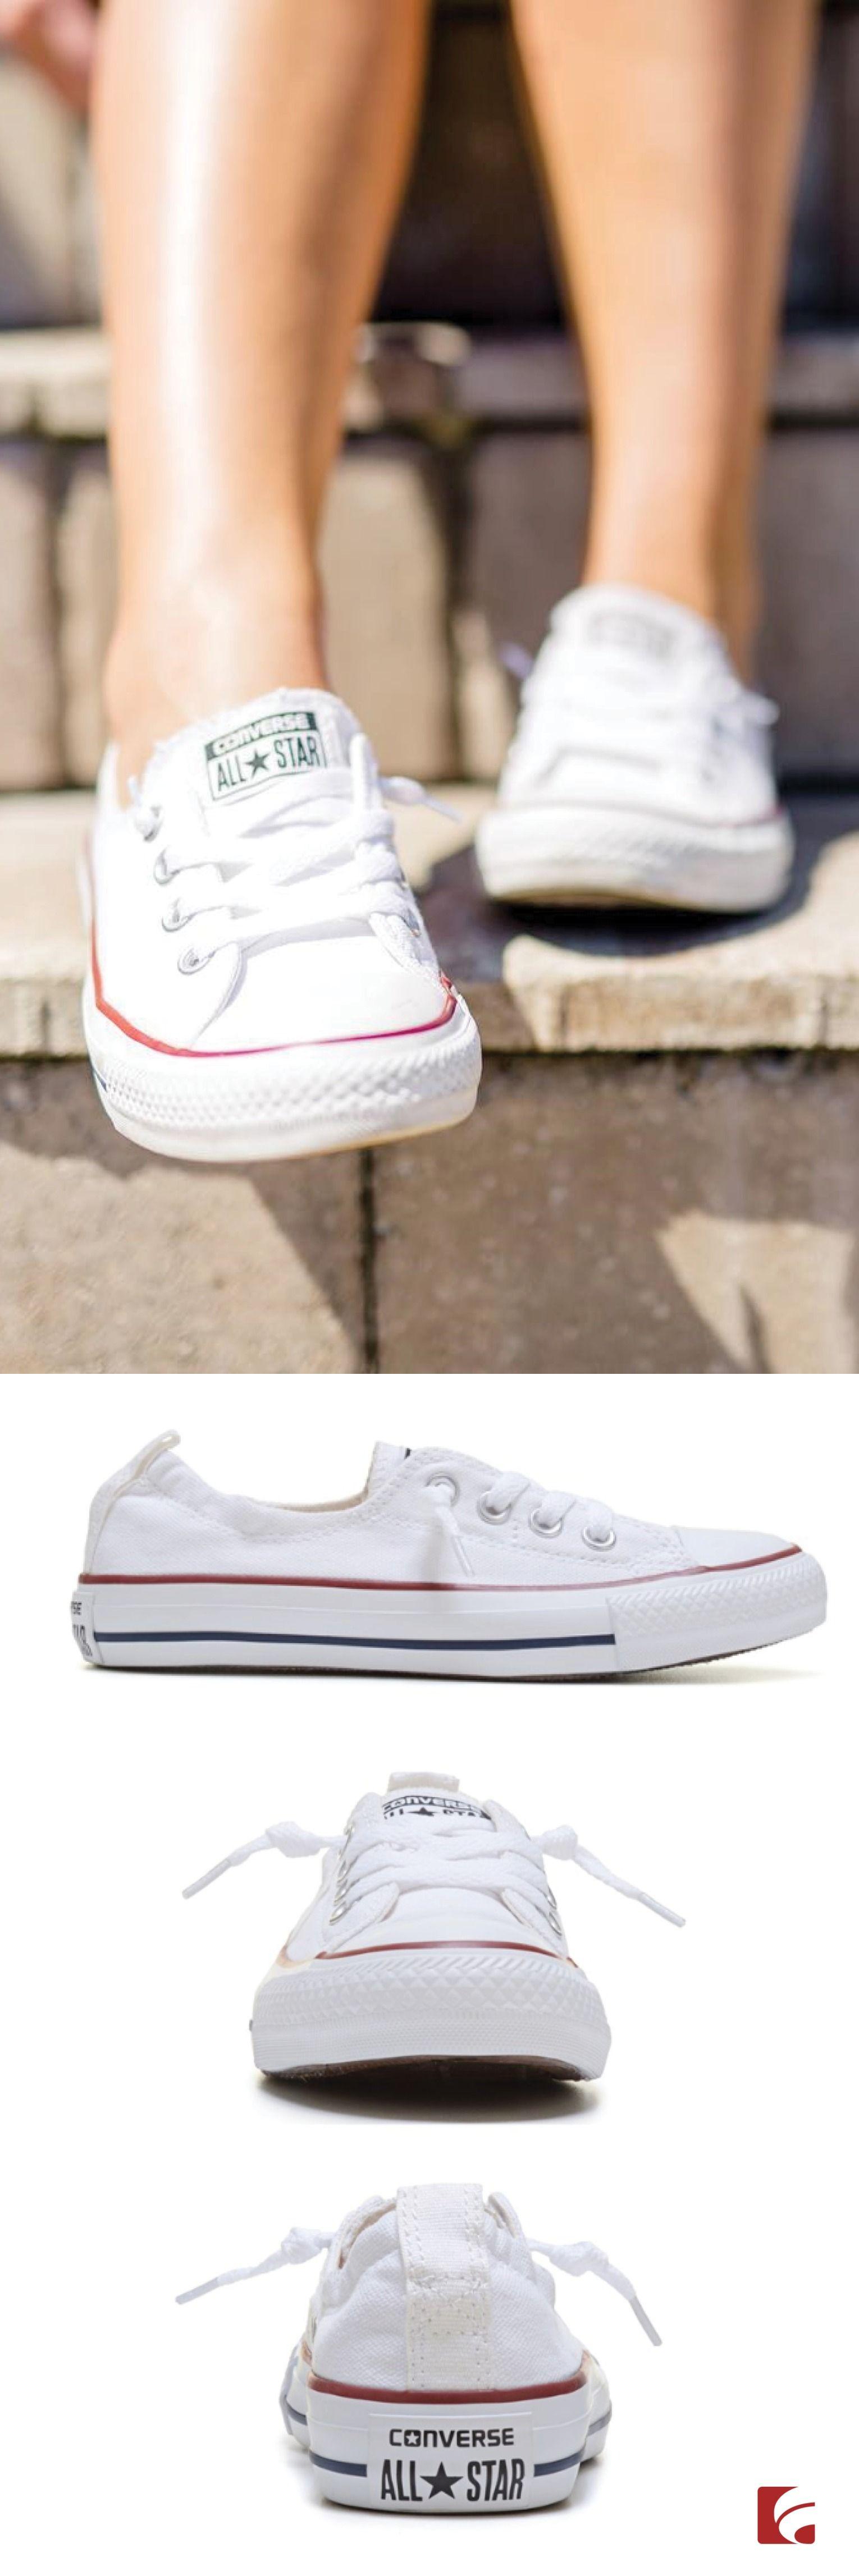 detailed look 1f58f d0d60 Converse Blancos o parecidos a converse.